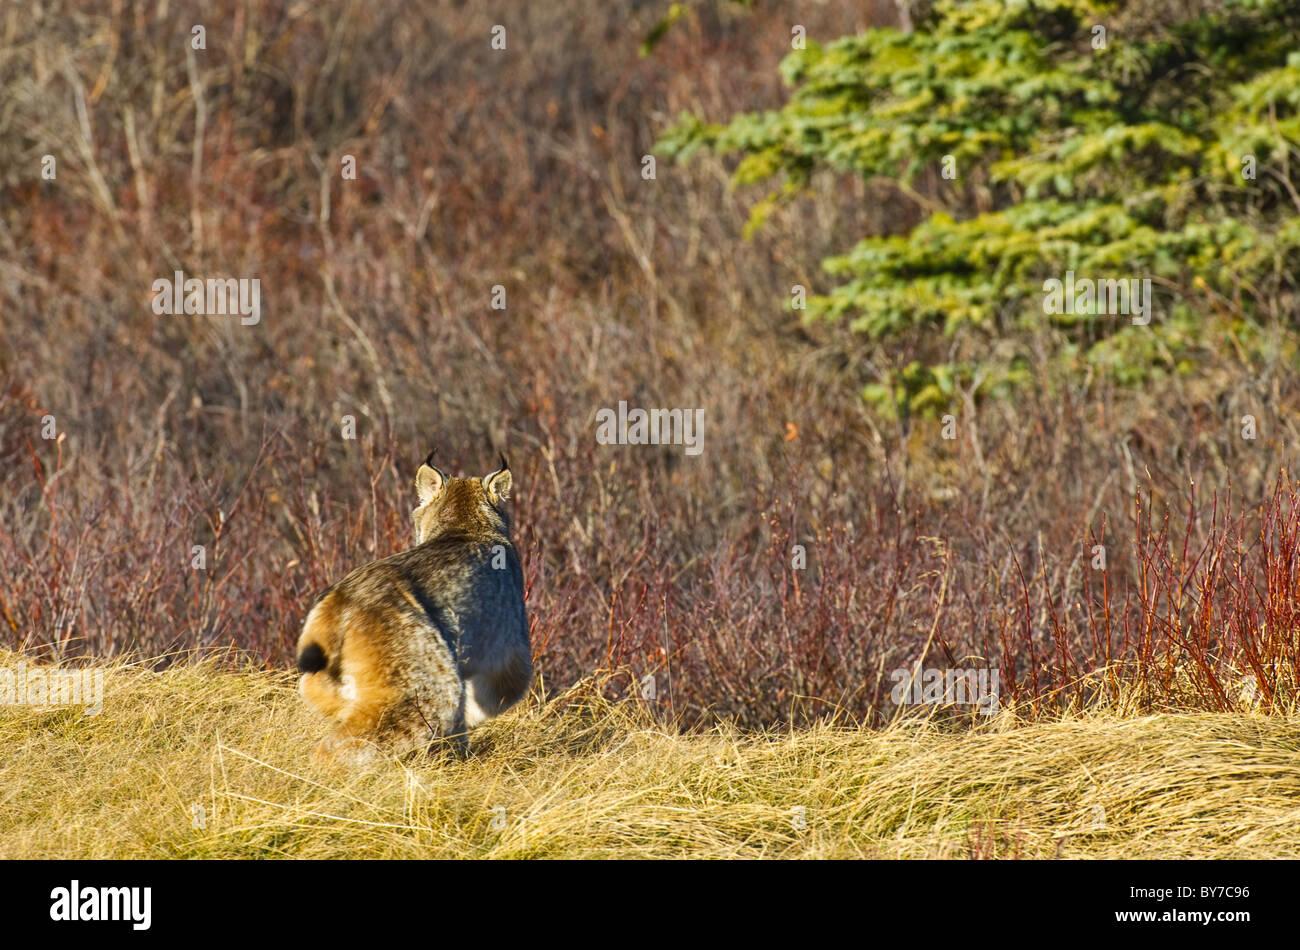 A Canadian lynx walking away. - Stock Image